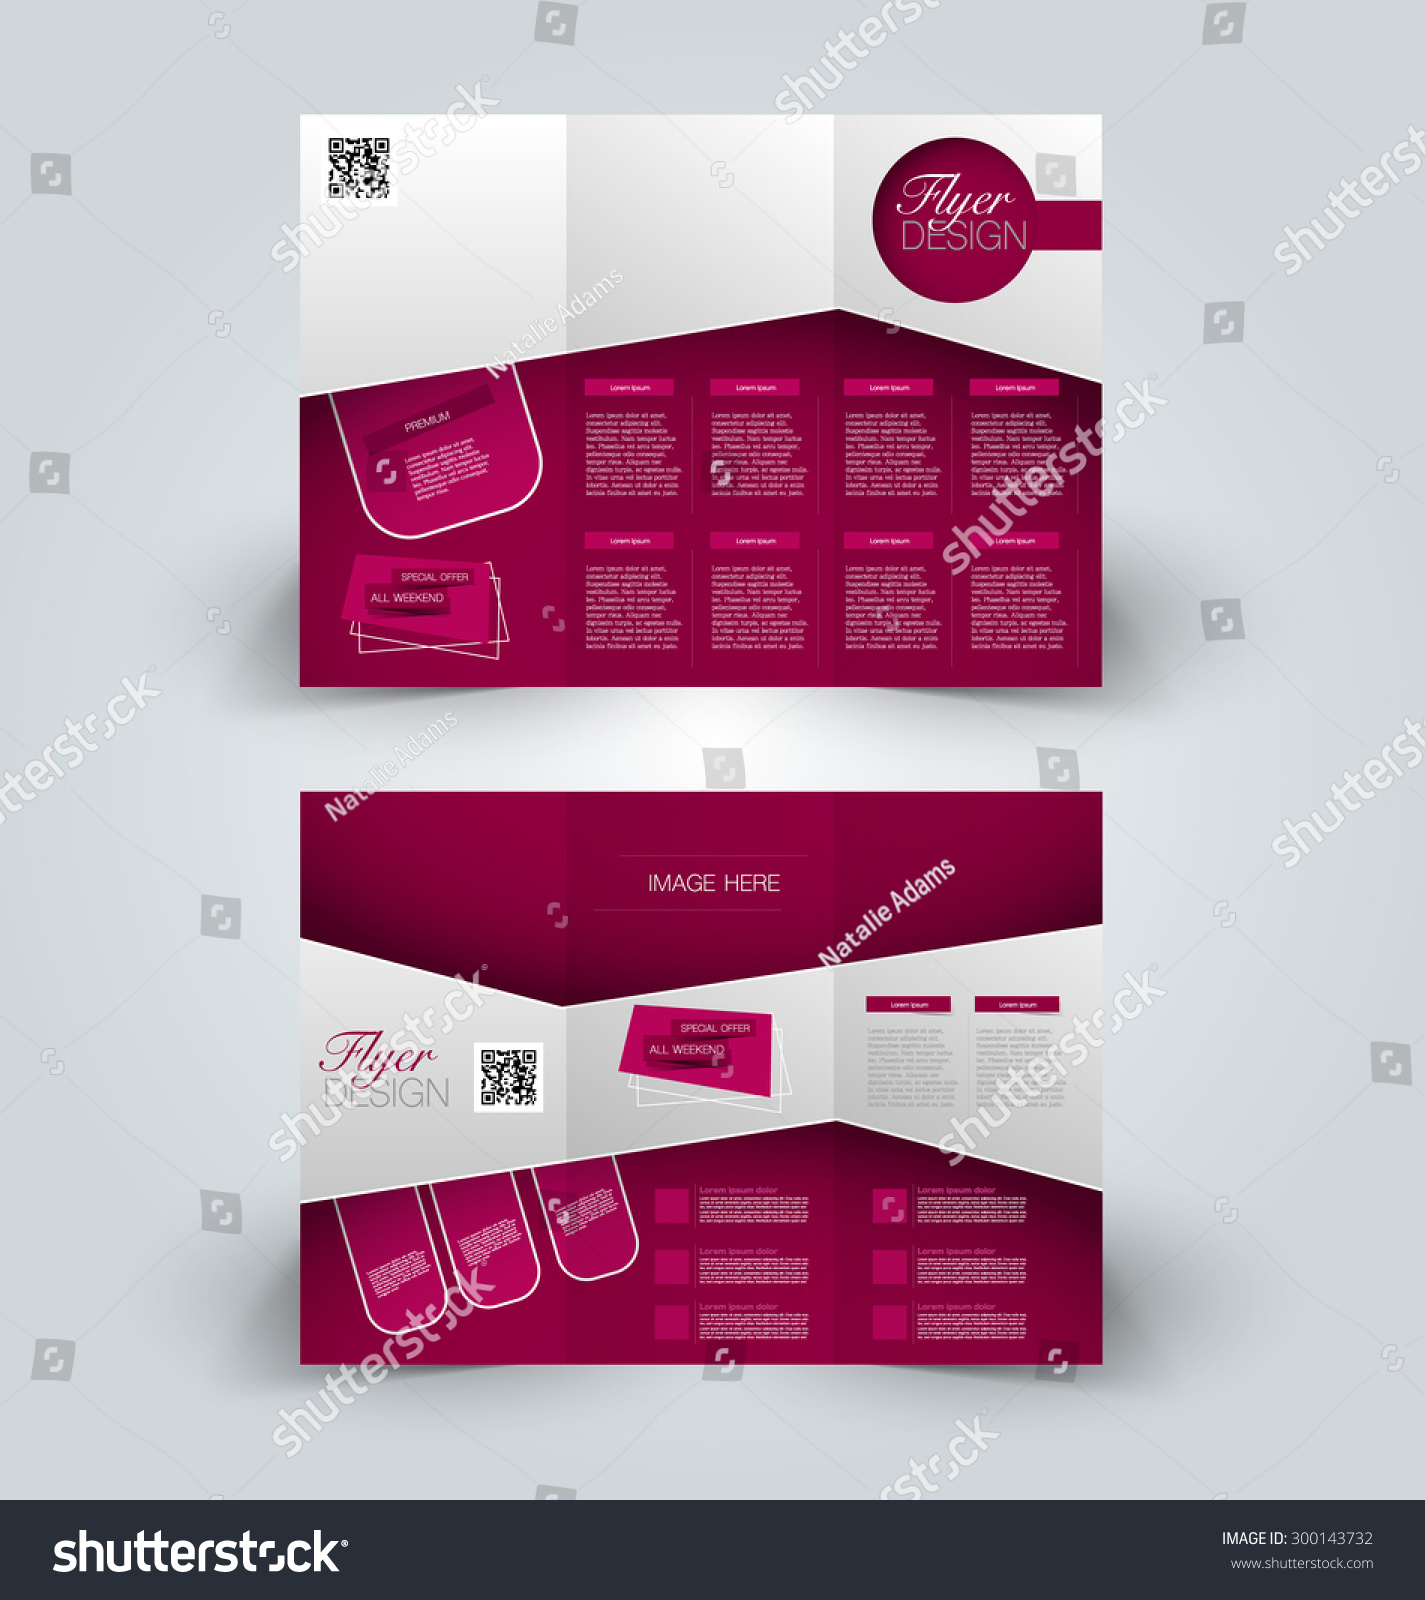 Brochure Mock Design Template Business Education Stock Vector ...